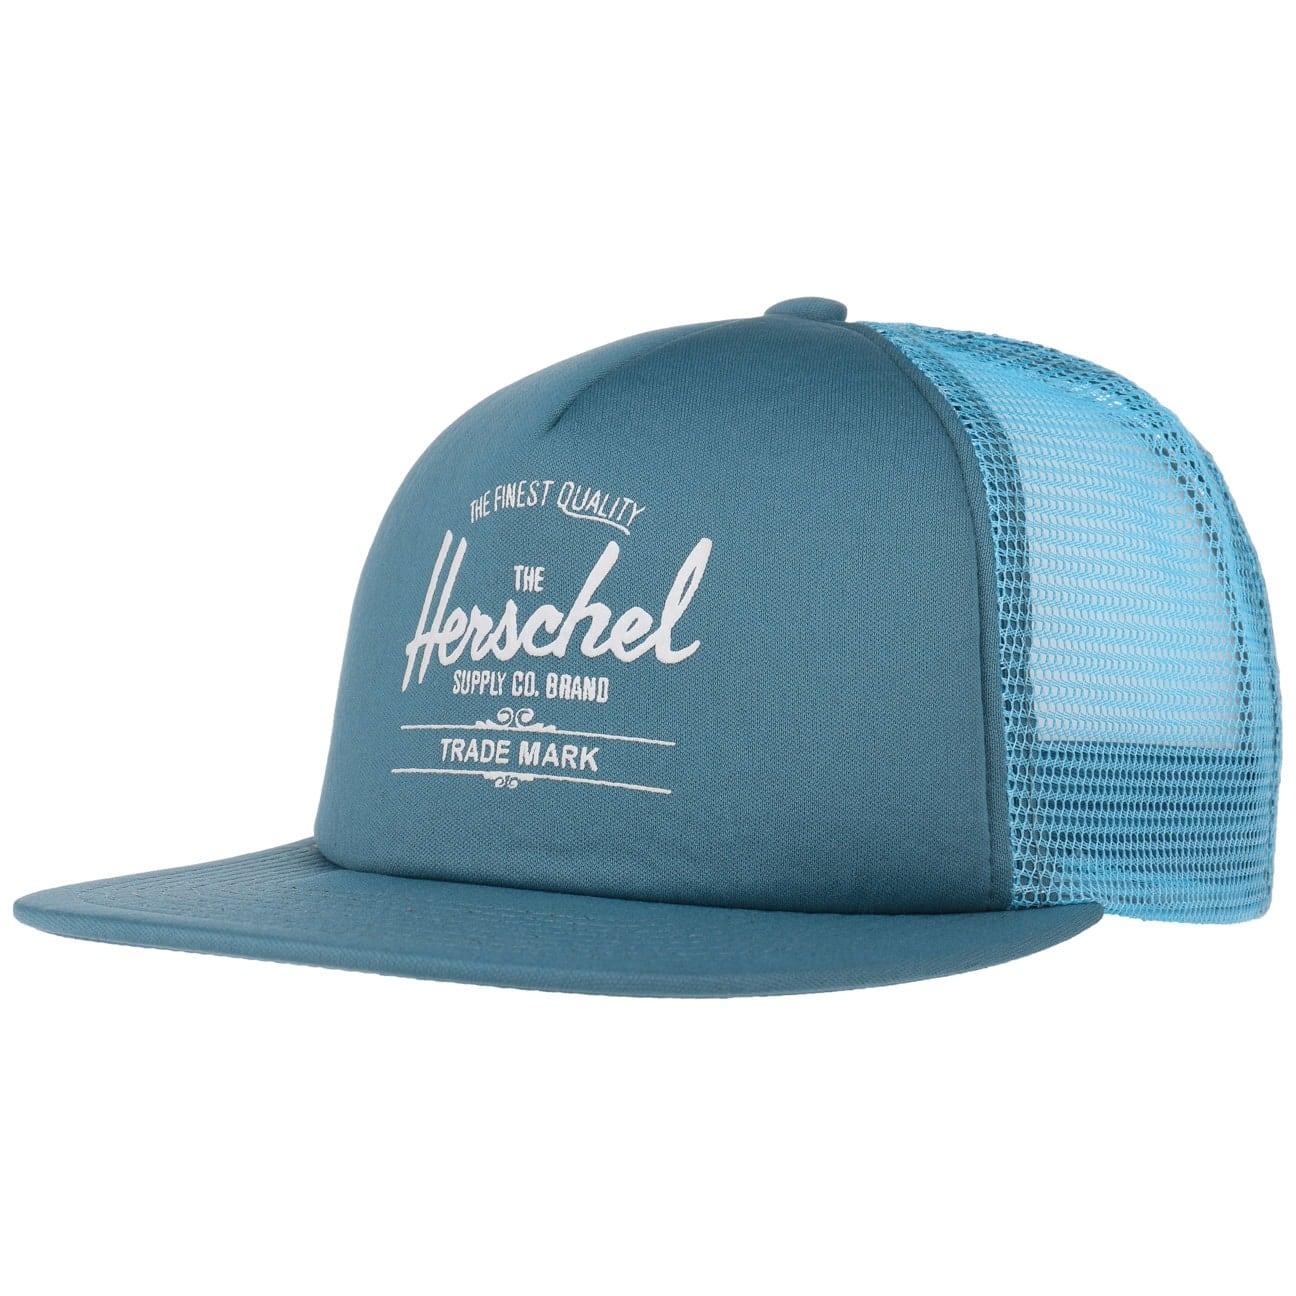 whaler-mesh-flatbrim-cap-by-herschel-flatbrim-cap